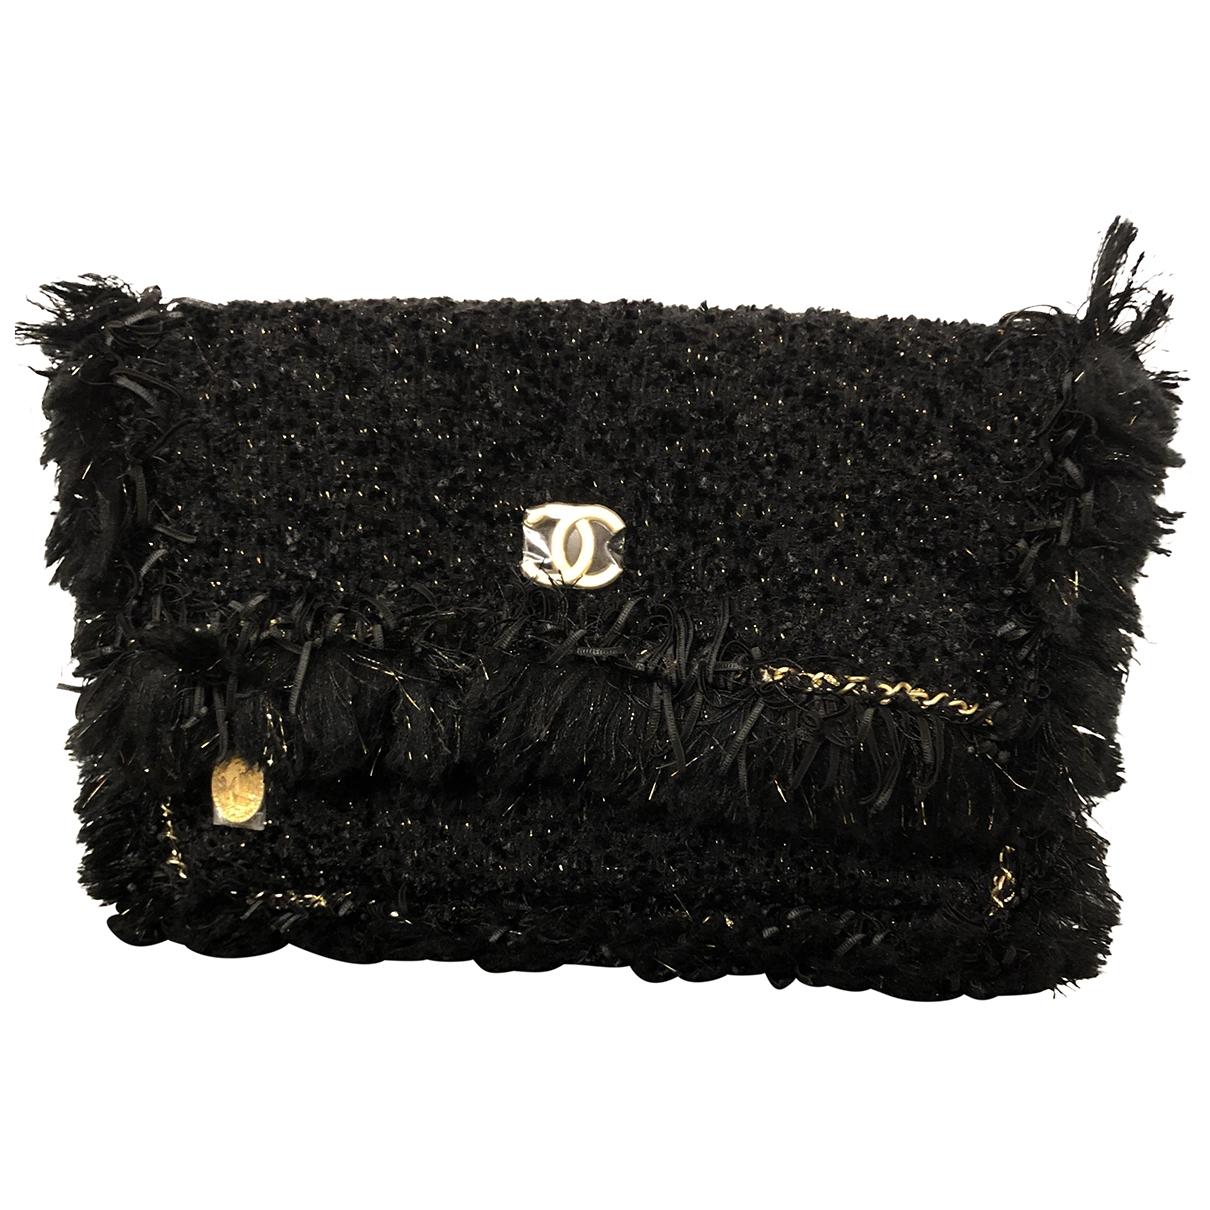 Chanel \N Clutch in  Schwarz Tweed